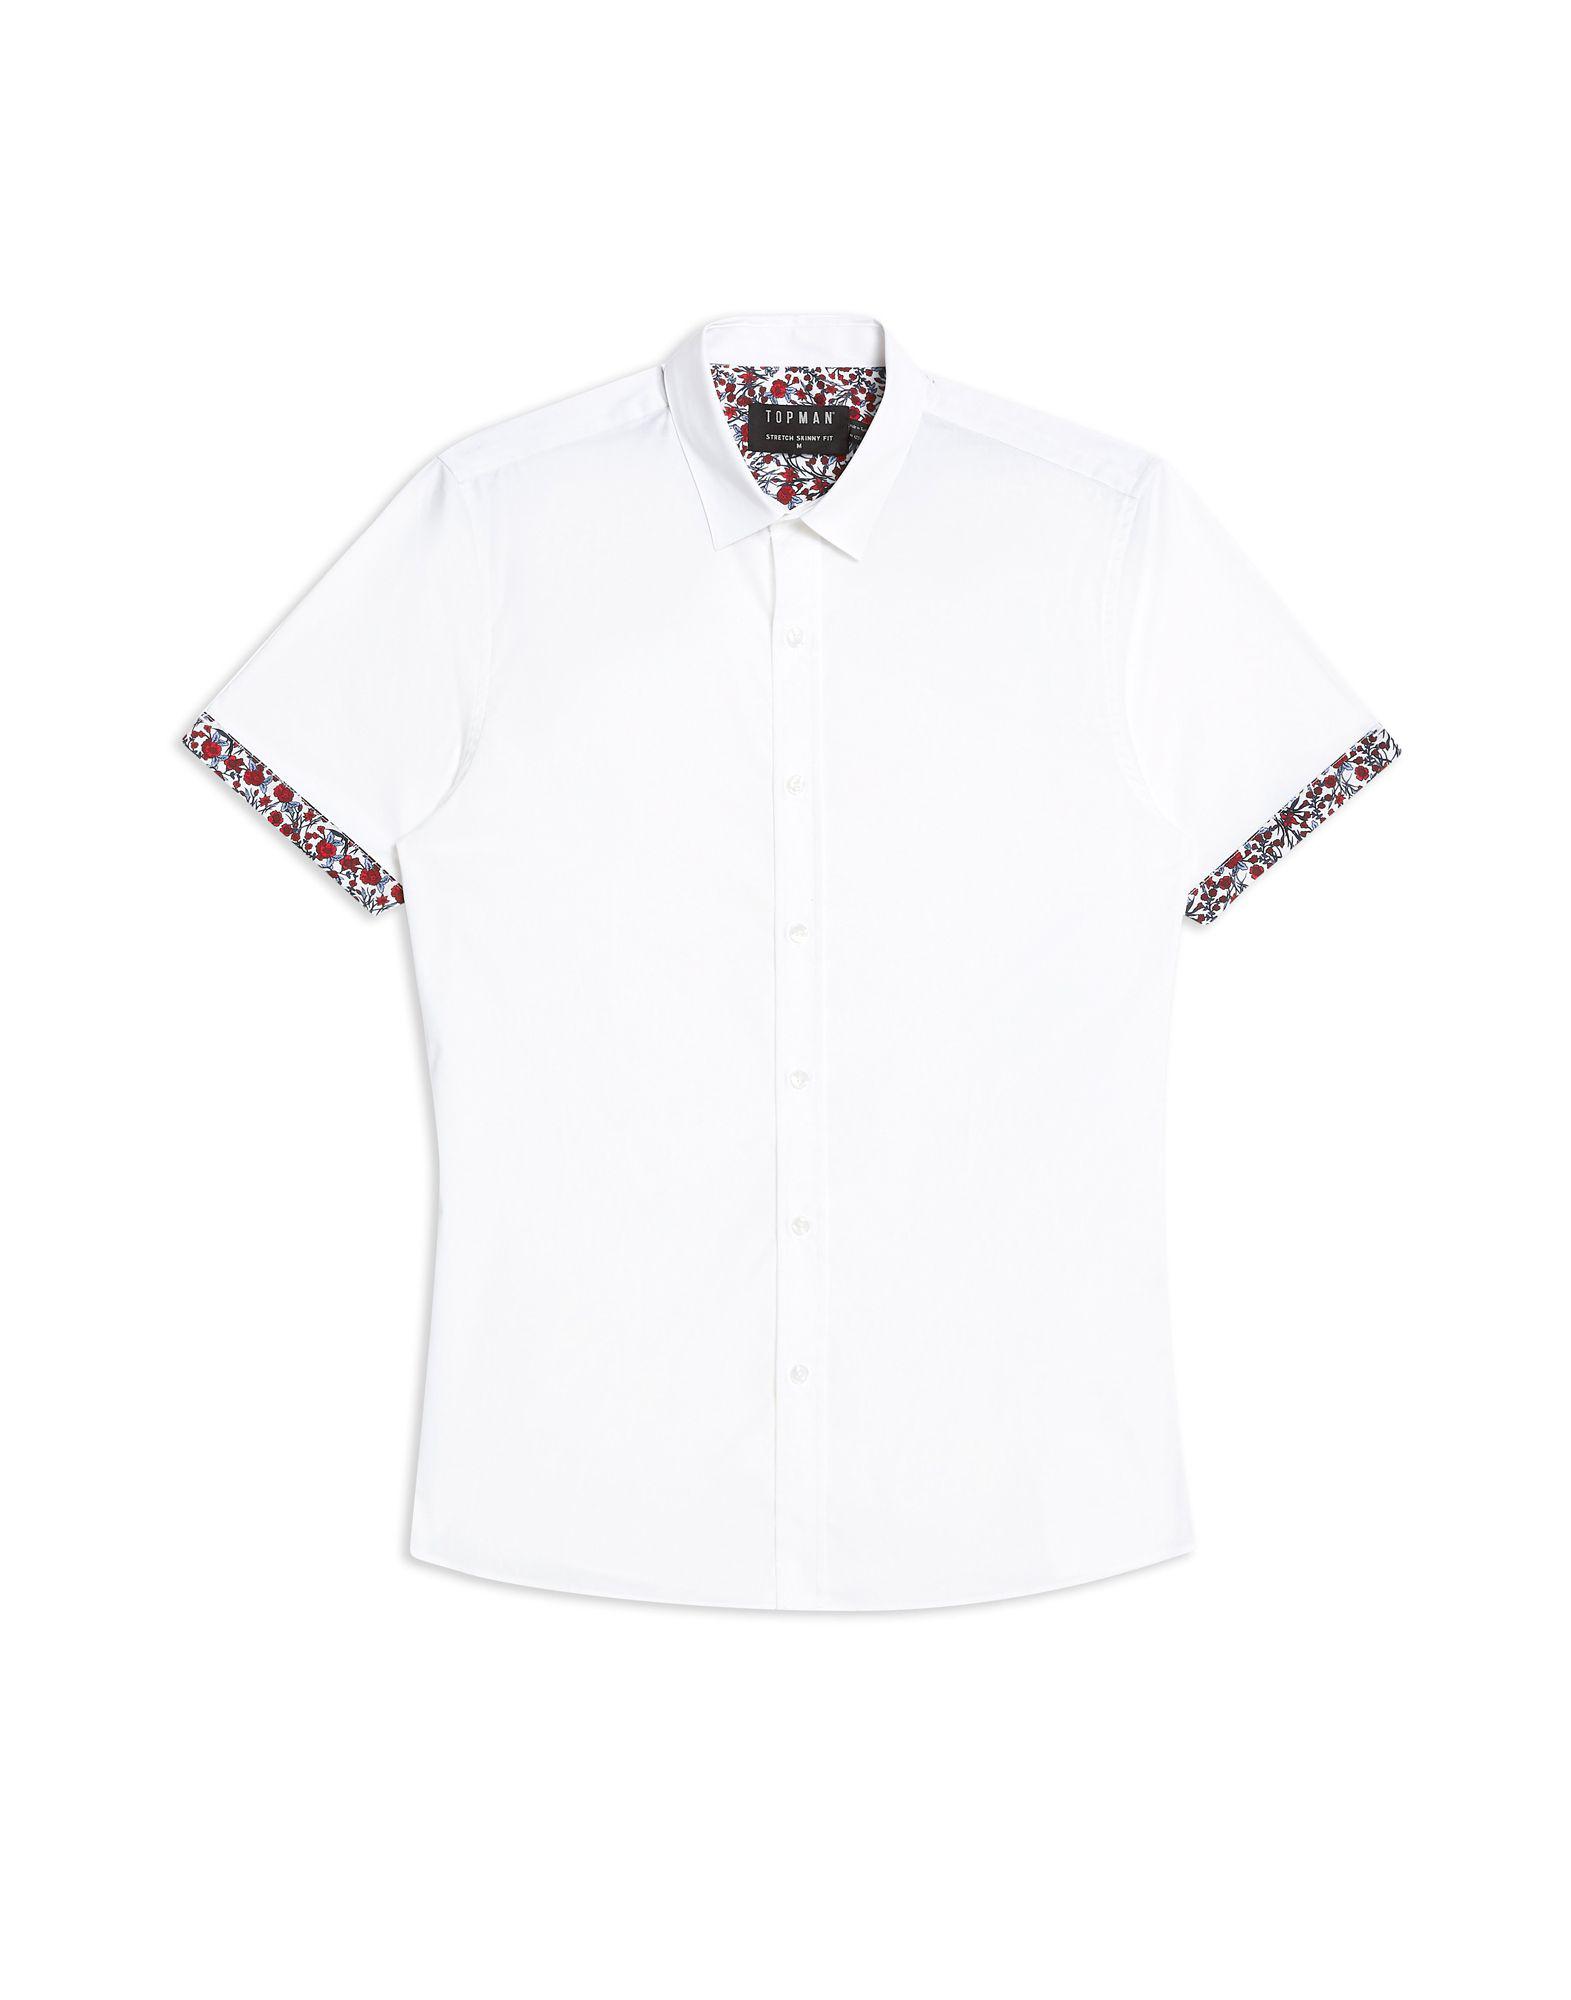 208c2b52296 Topman Shirts In White